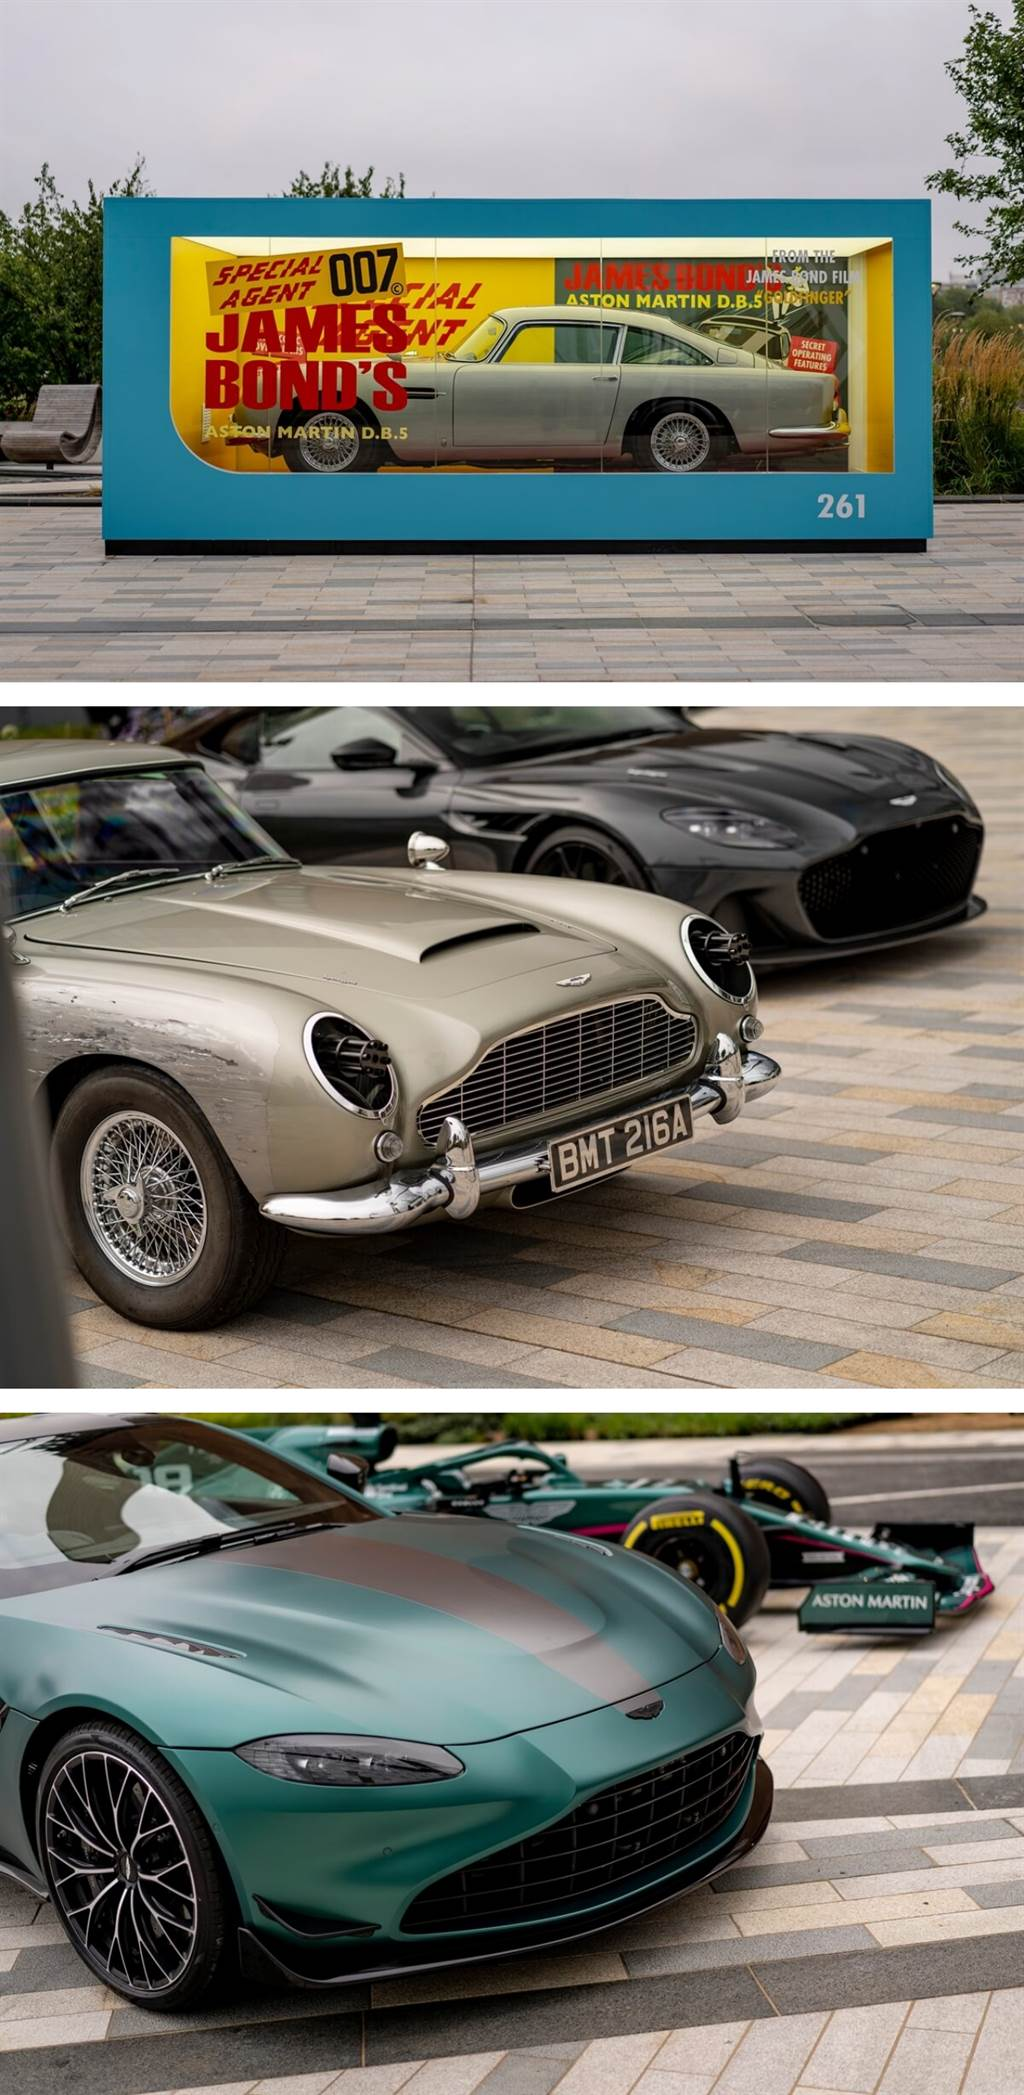 Aston Martin推出最新一集007:生死交戰宣傳影片,並製作了全尺寸DB5玩具模型盒(圖/CarStuff)